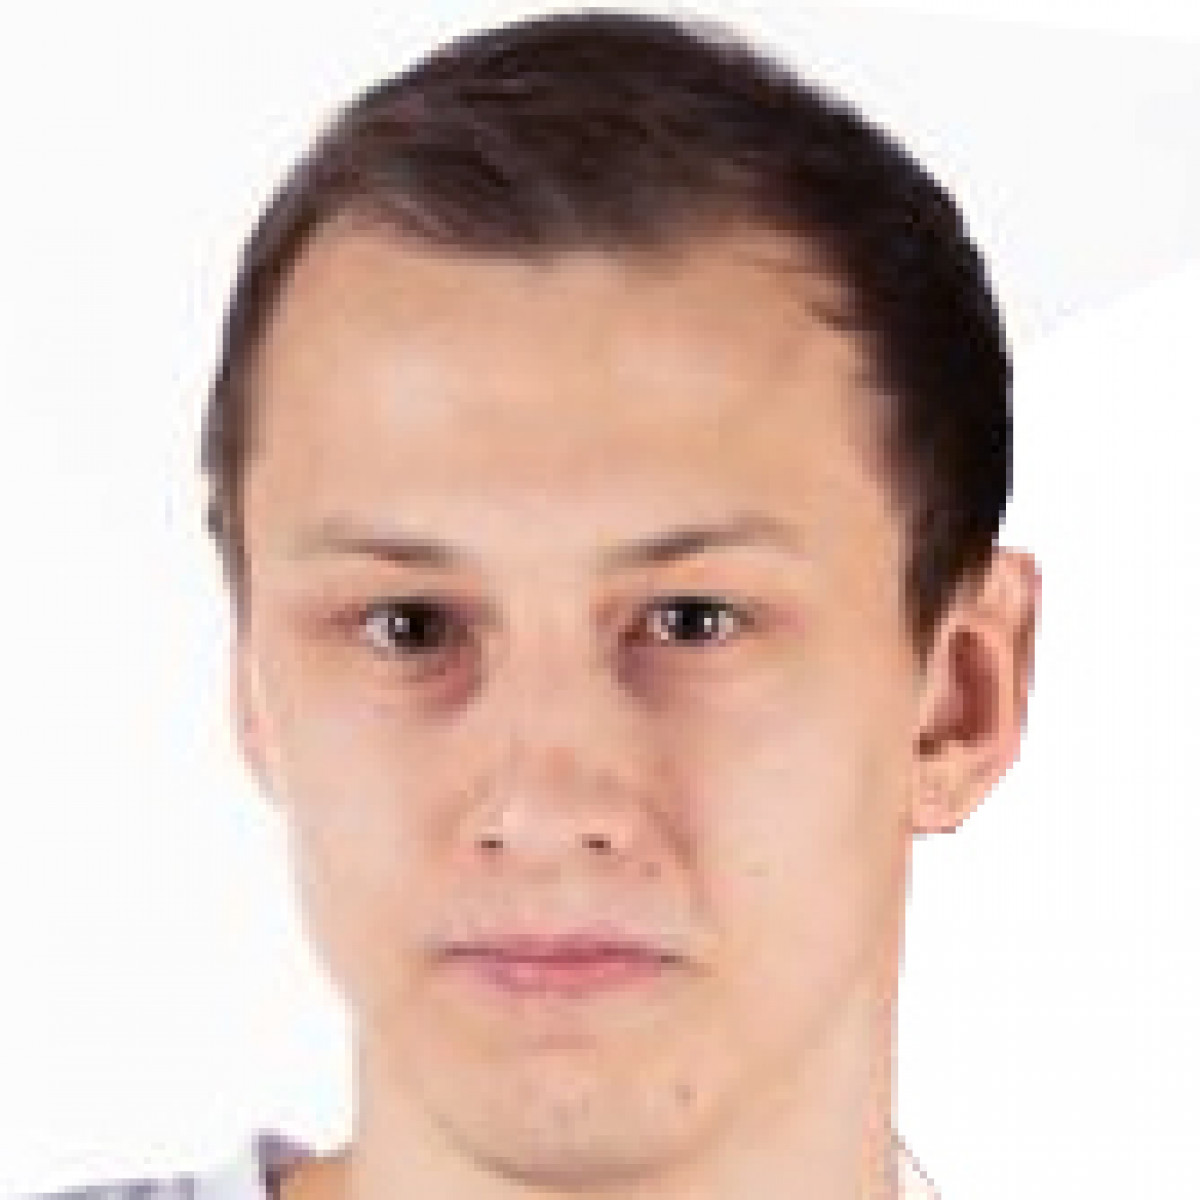 Joonas Lehtoranta